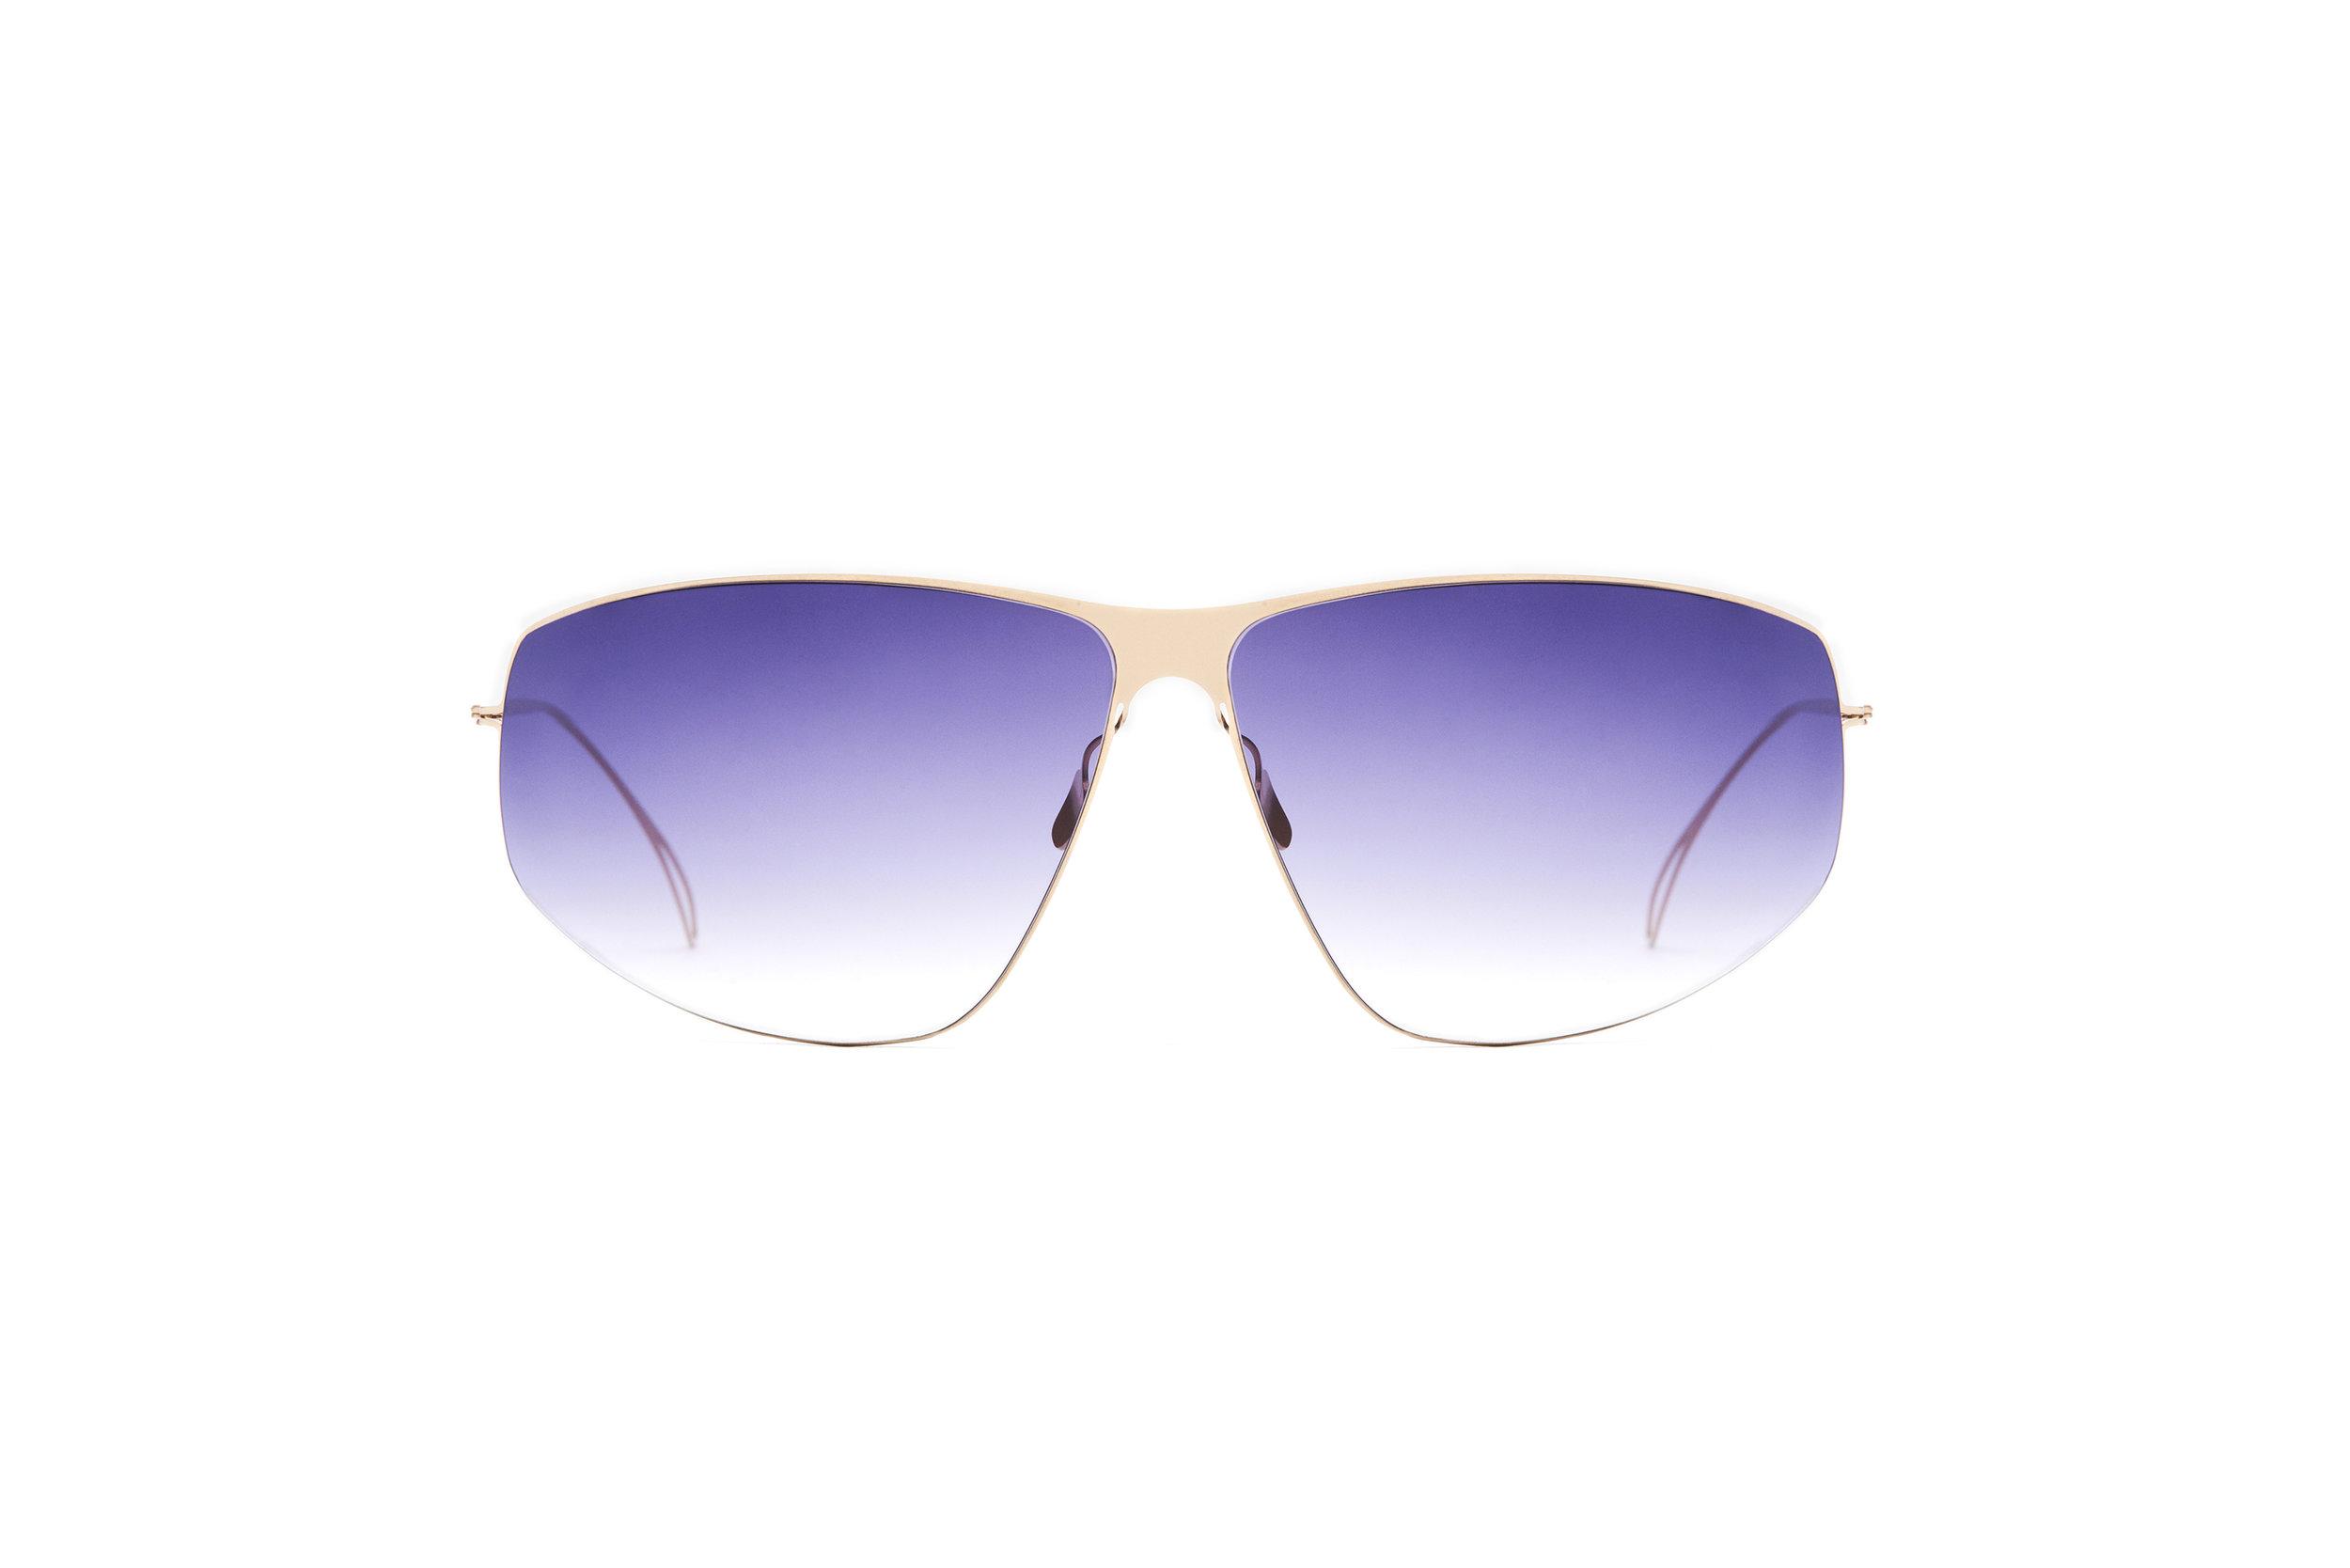 haffmans_neumeister_hunt_cremant_purplerain_gradient_ultralight_sunglasses_front_102478.jpg